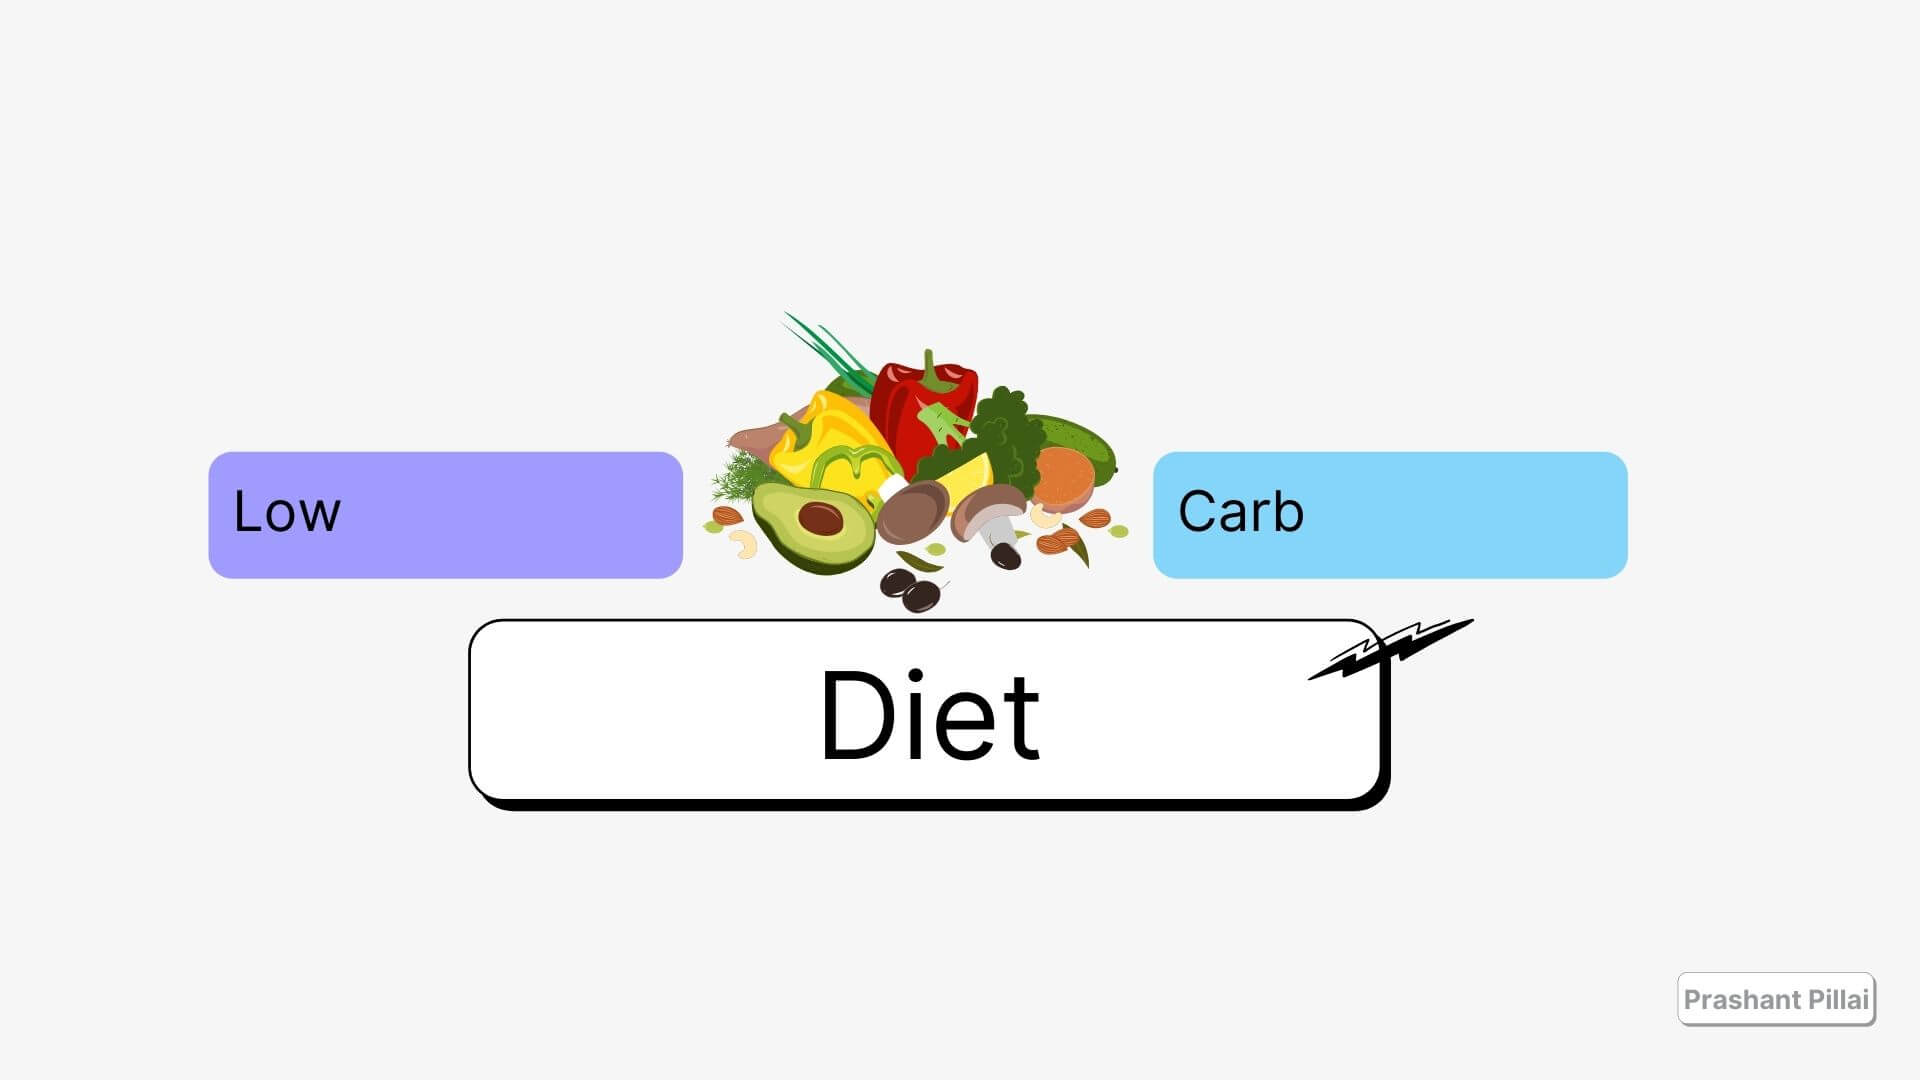 Low carb diet illustrations